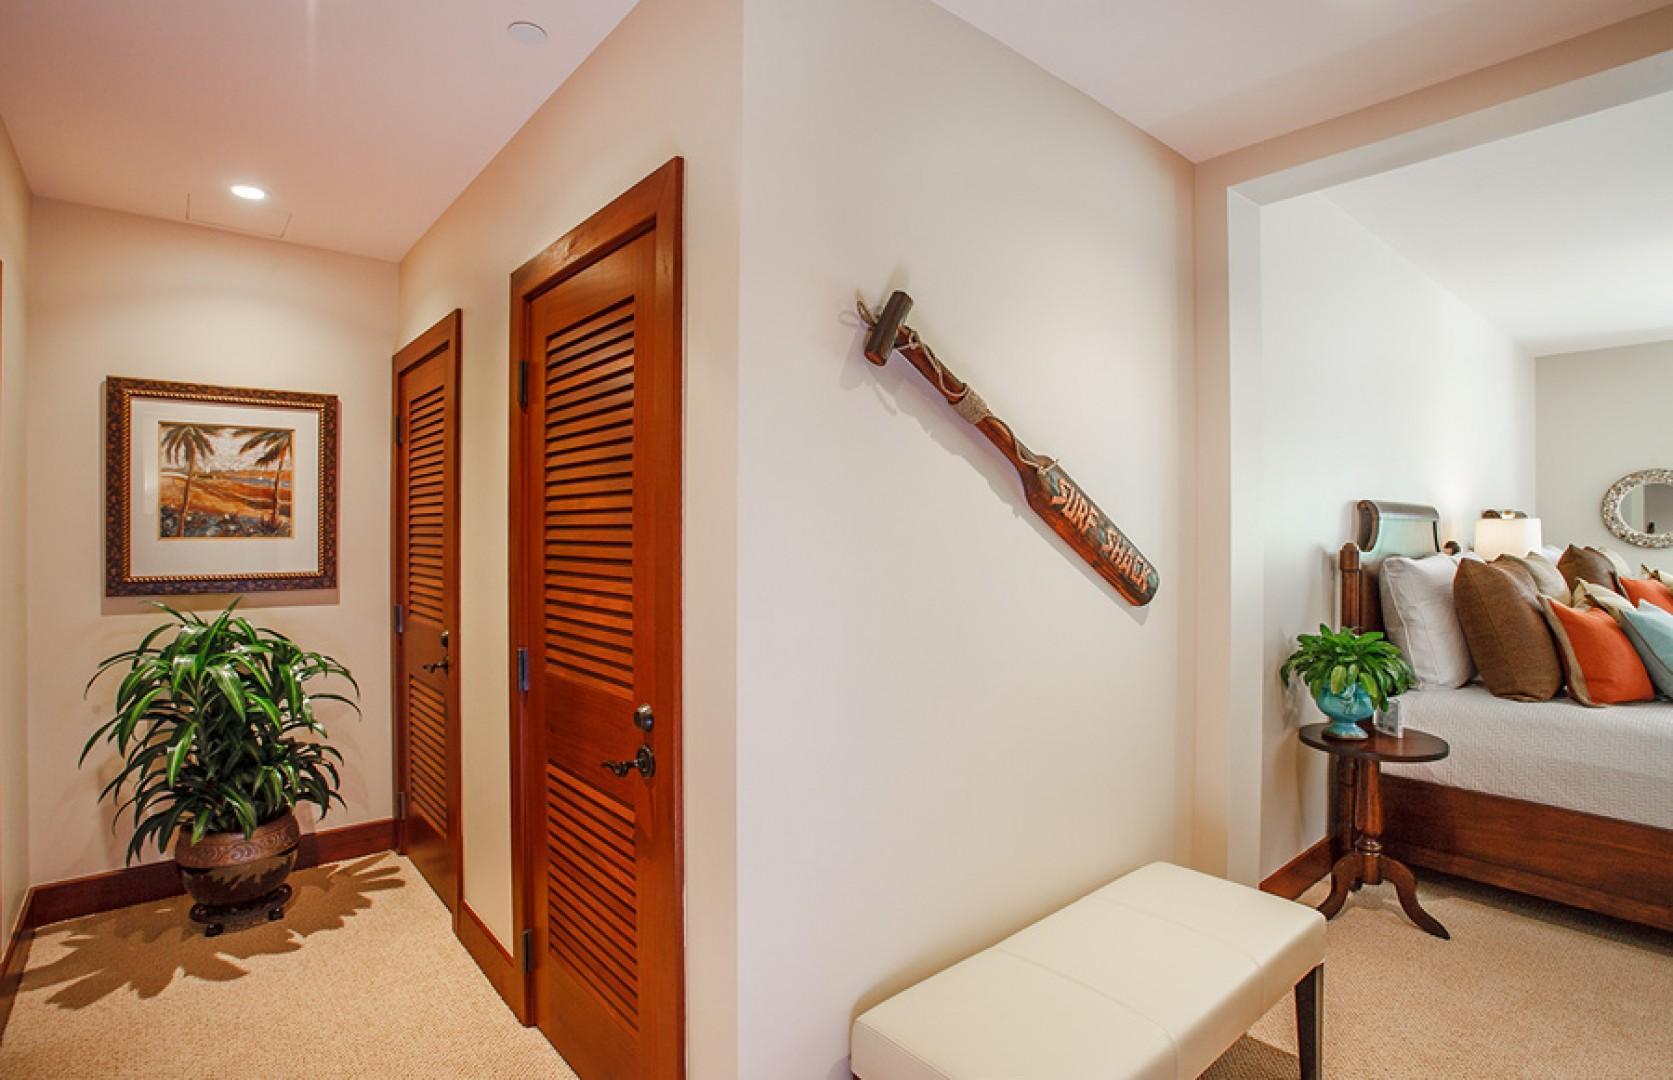 Third bedroom, with two queen-size beds, en suite bath, desk, and garden/patio access.